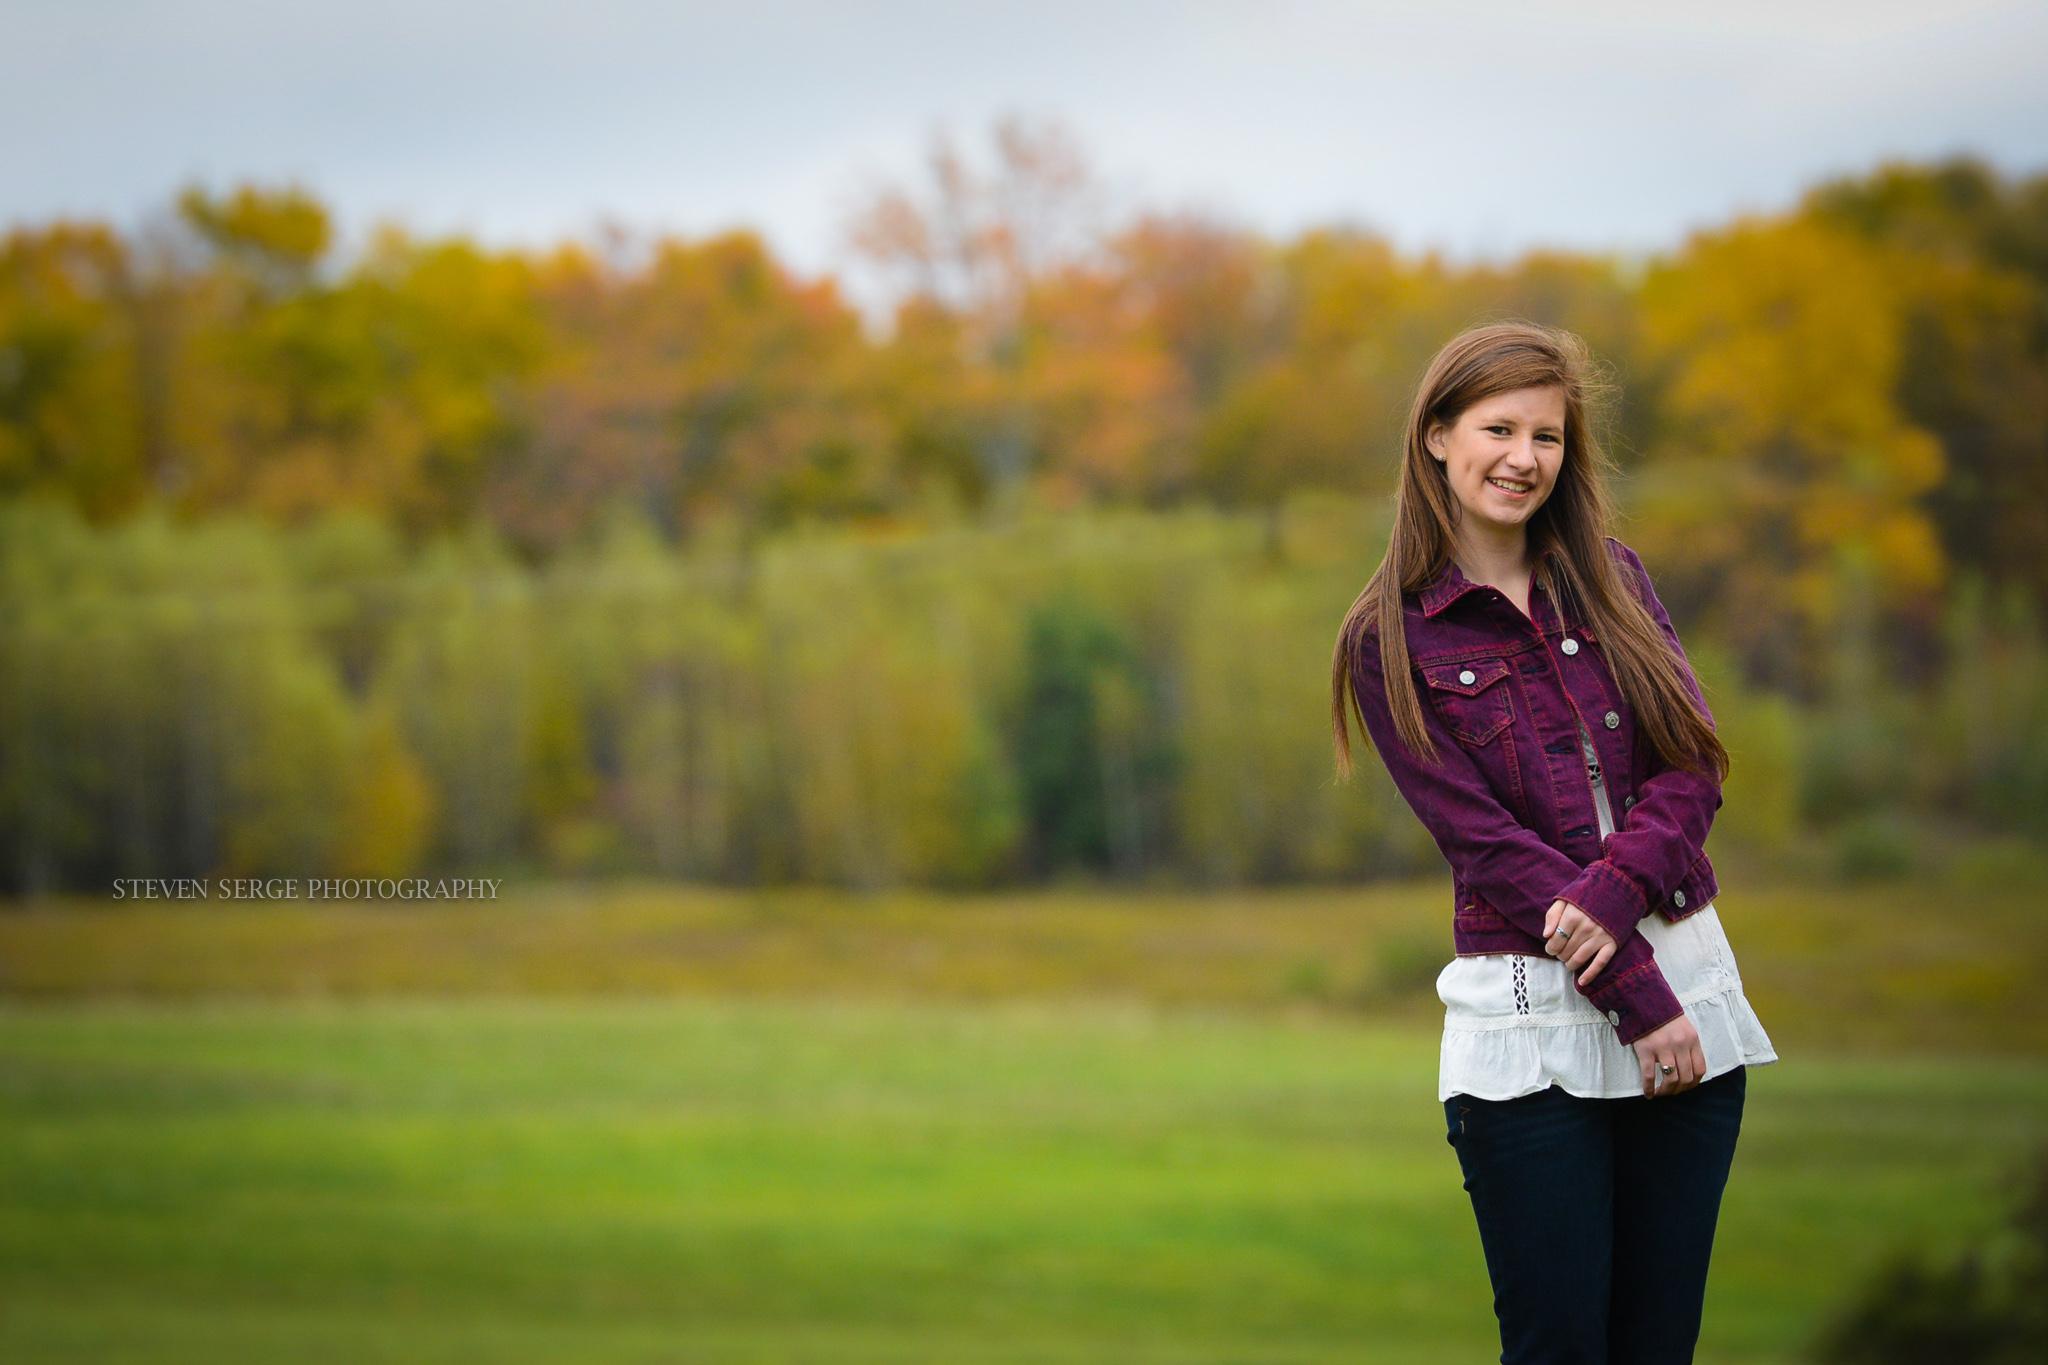 High-School-Prep-Scranton-nepa-senior-portrait-photographer-3.jpg